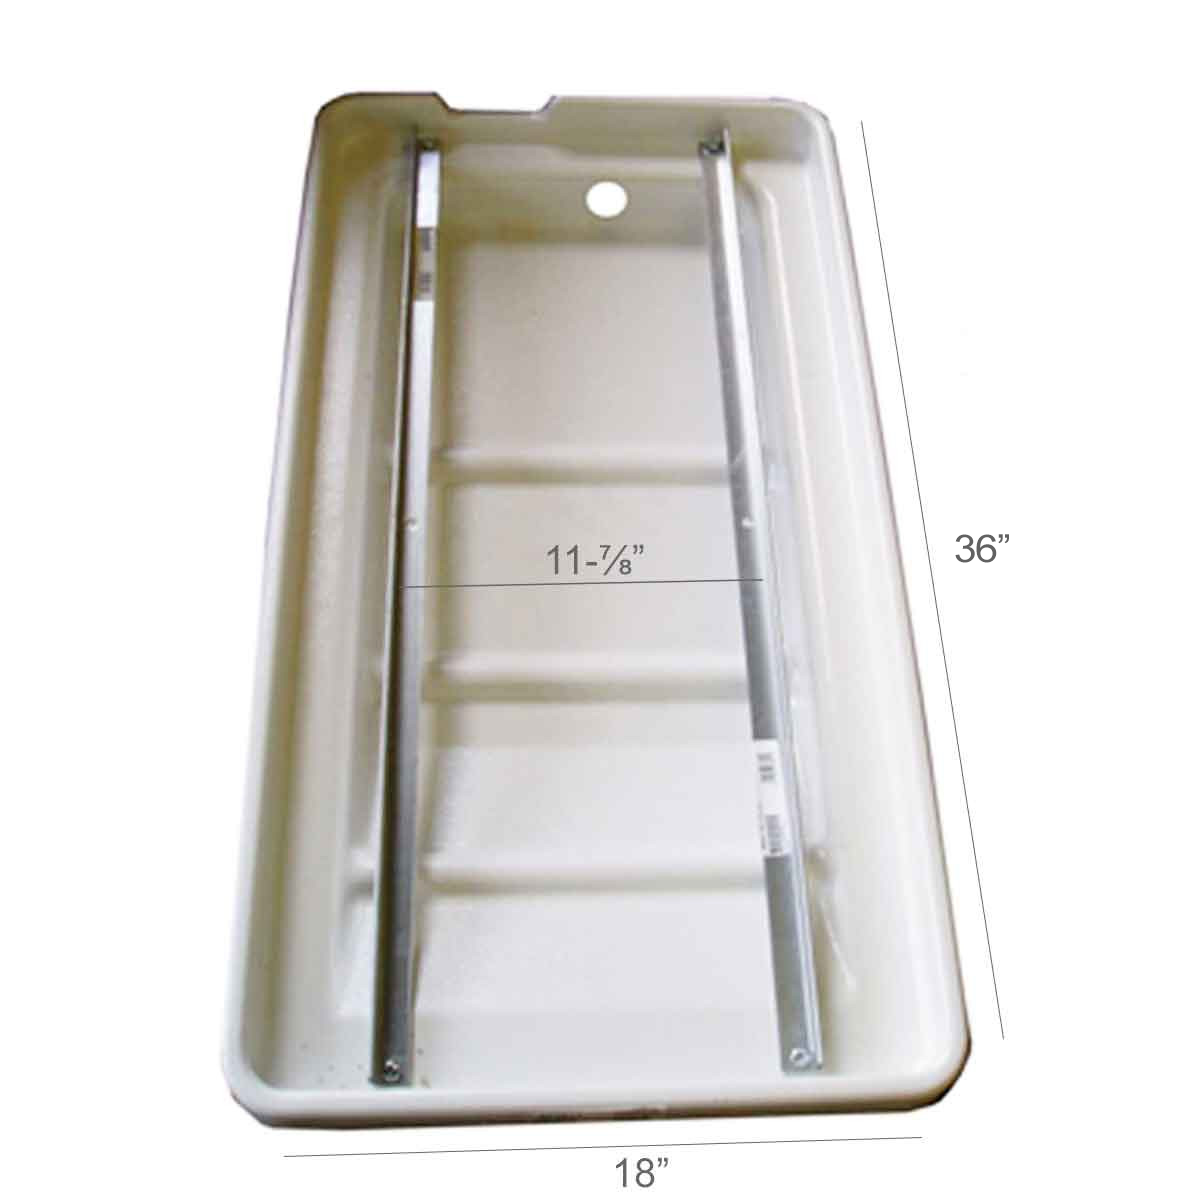 Felker Tilemaster water Pan